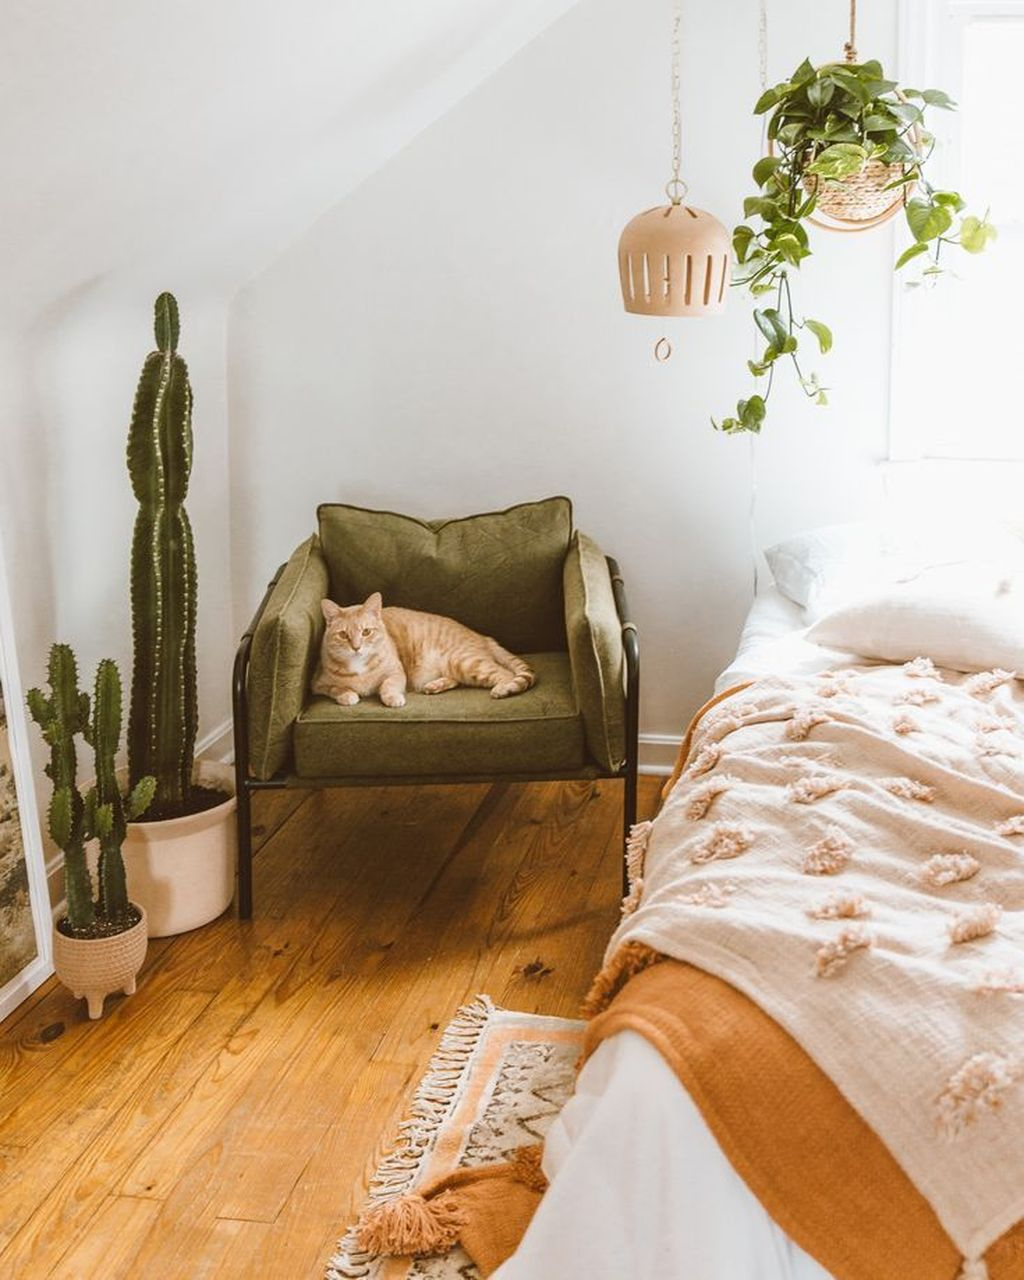 Lovely Spring Bedroom Decor Ideas Trending This Year 15